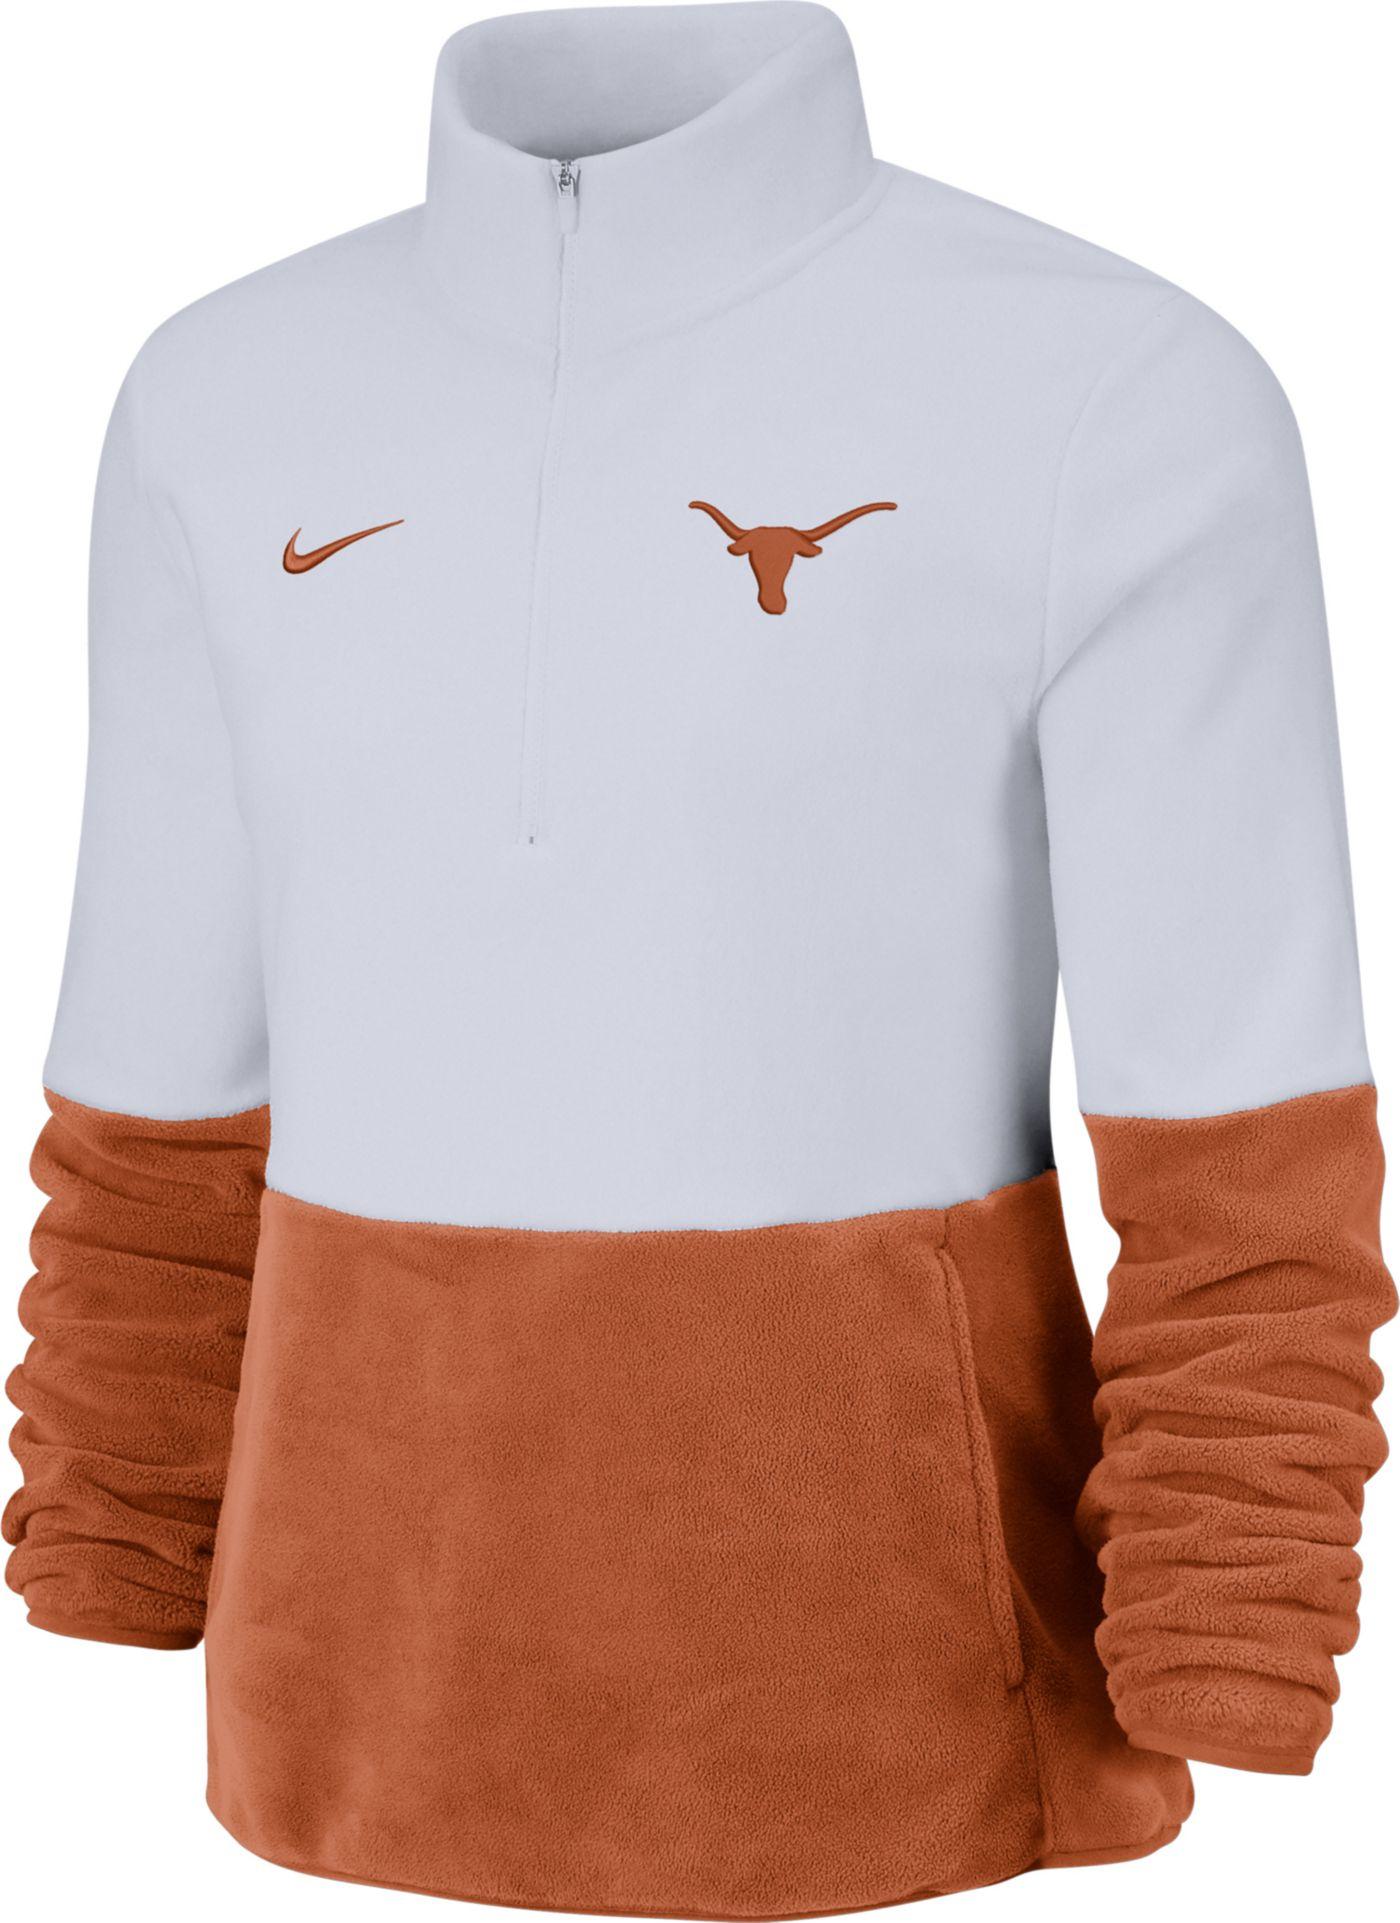 Nike Women's Texas Longhorns Cozy Therma White Half-Zip Fleece